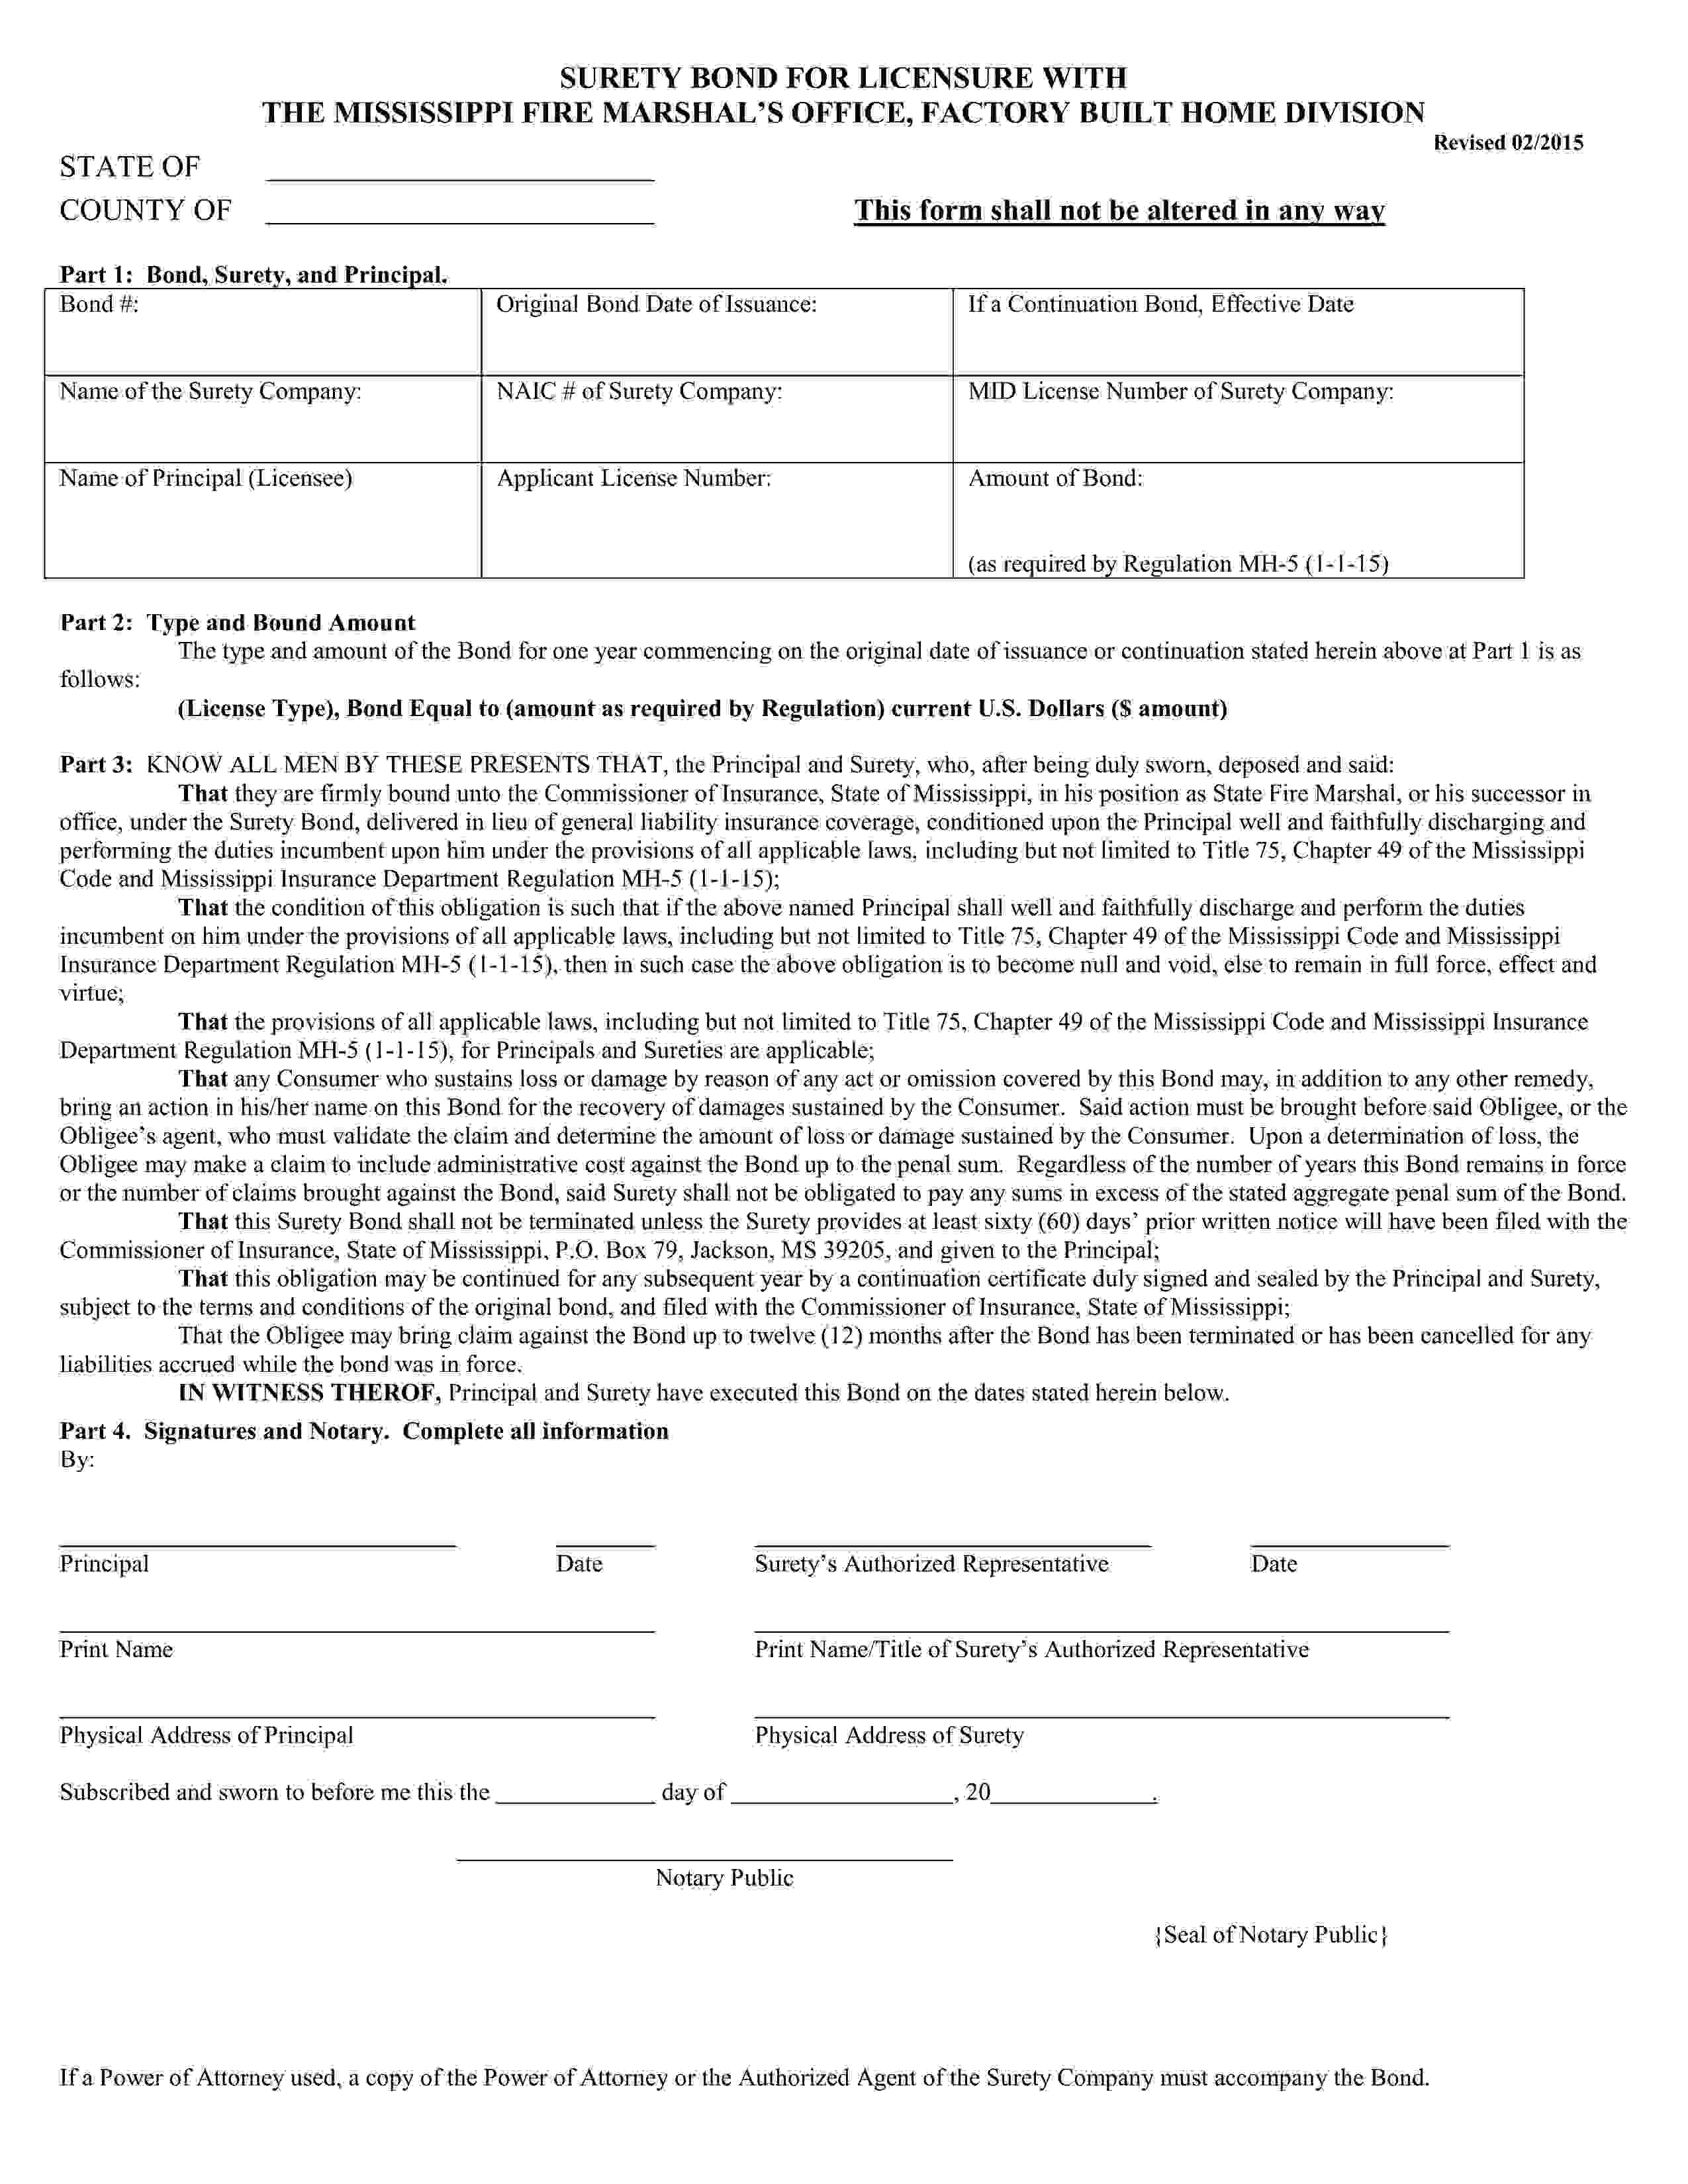 Mississippi Commissioner of Insurance Manufactured Home Retailer Bond sample image